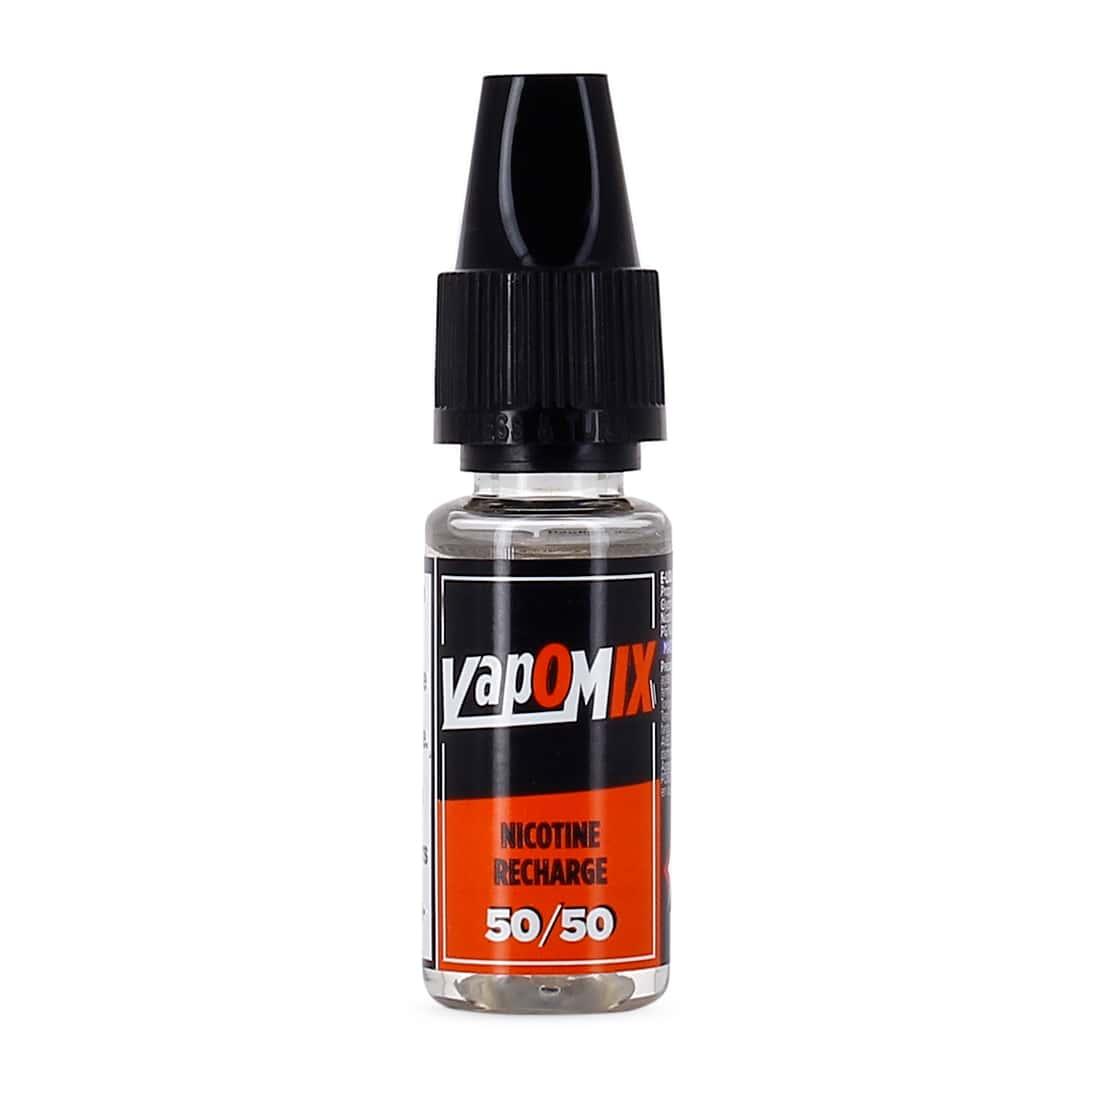 Photo de Booster Nicotine Vapomix 20 mg/mL 10 mL PG/VG 50/50